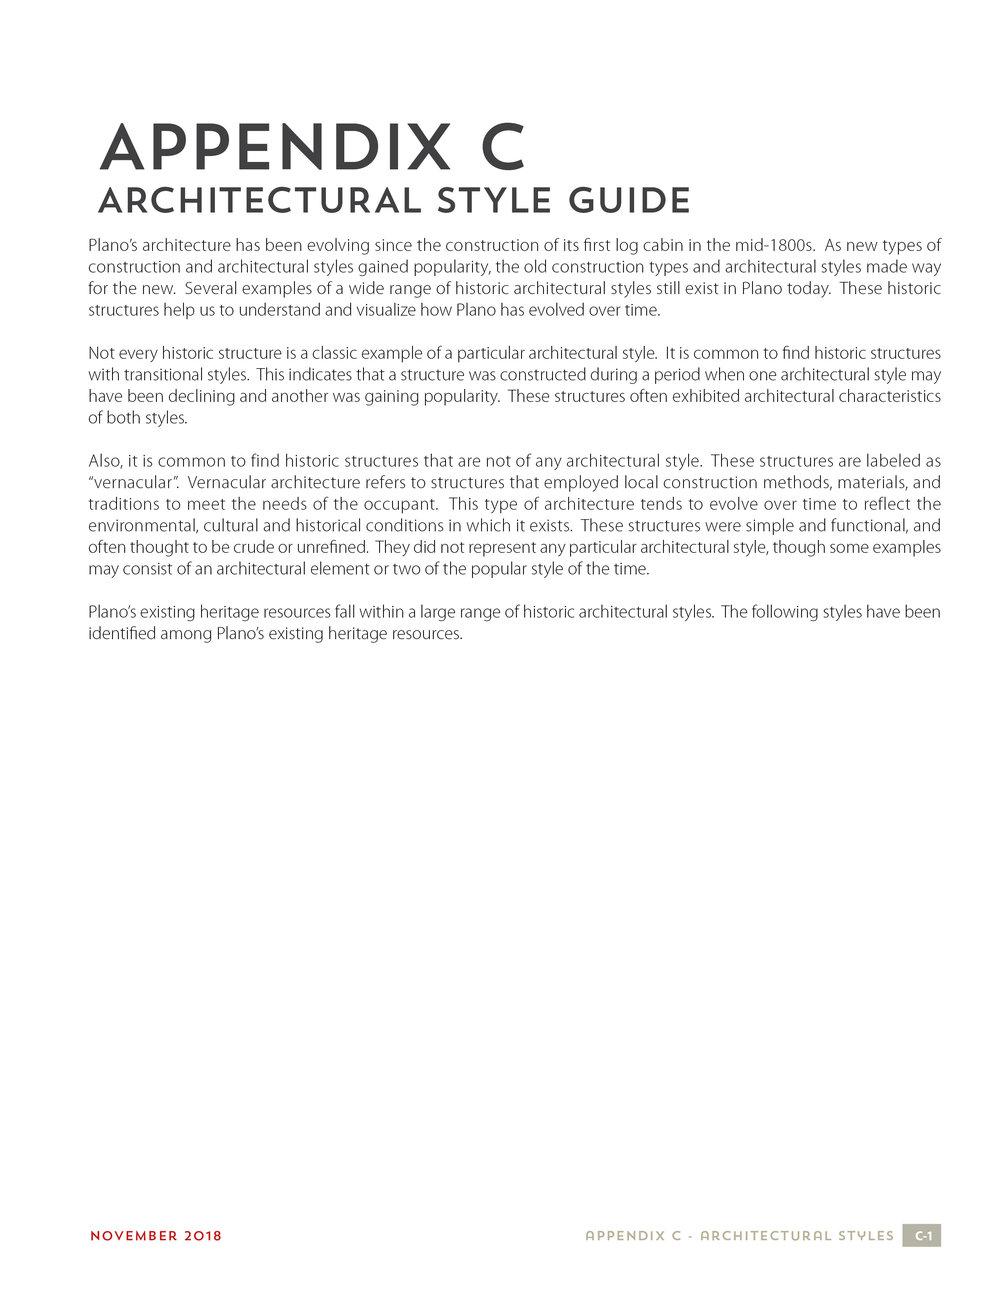 Appendix C - Architectural Style Guide